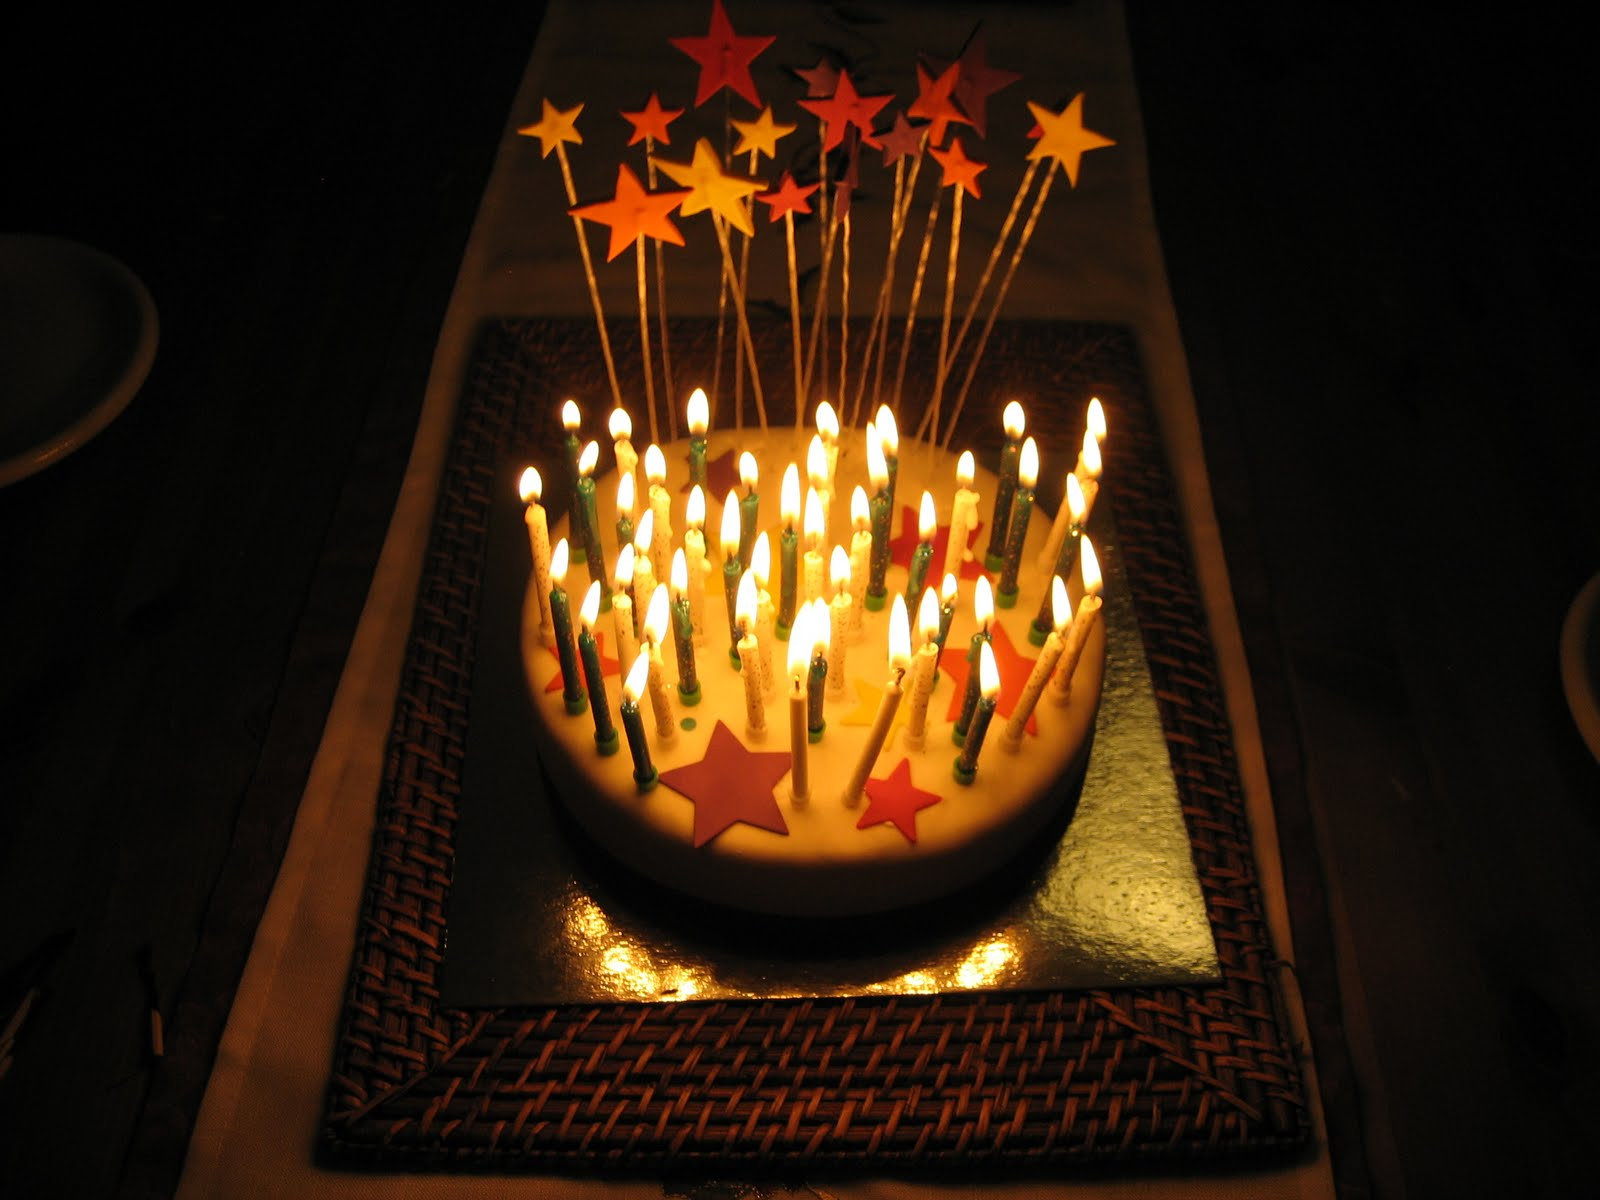 Images Birthday Cake On Fire : DarkDwarf Blog: Birthday Cake / Fire Hazard